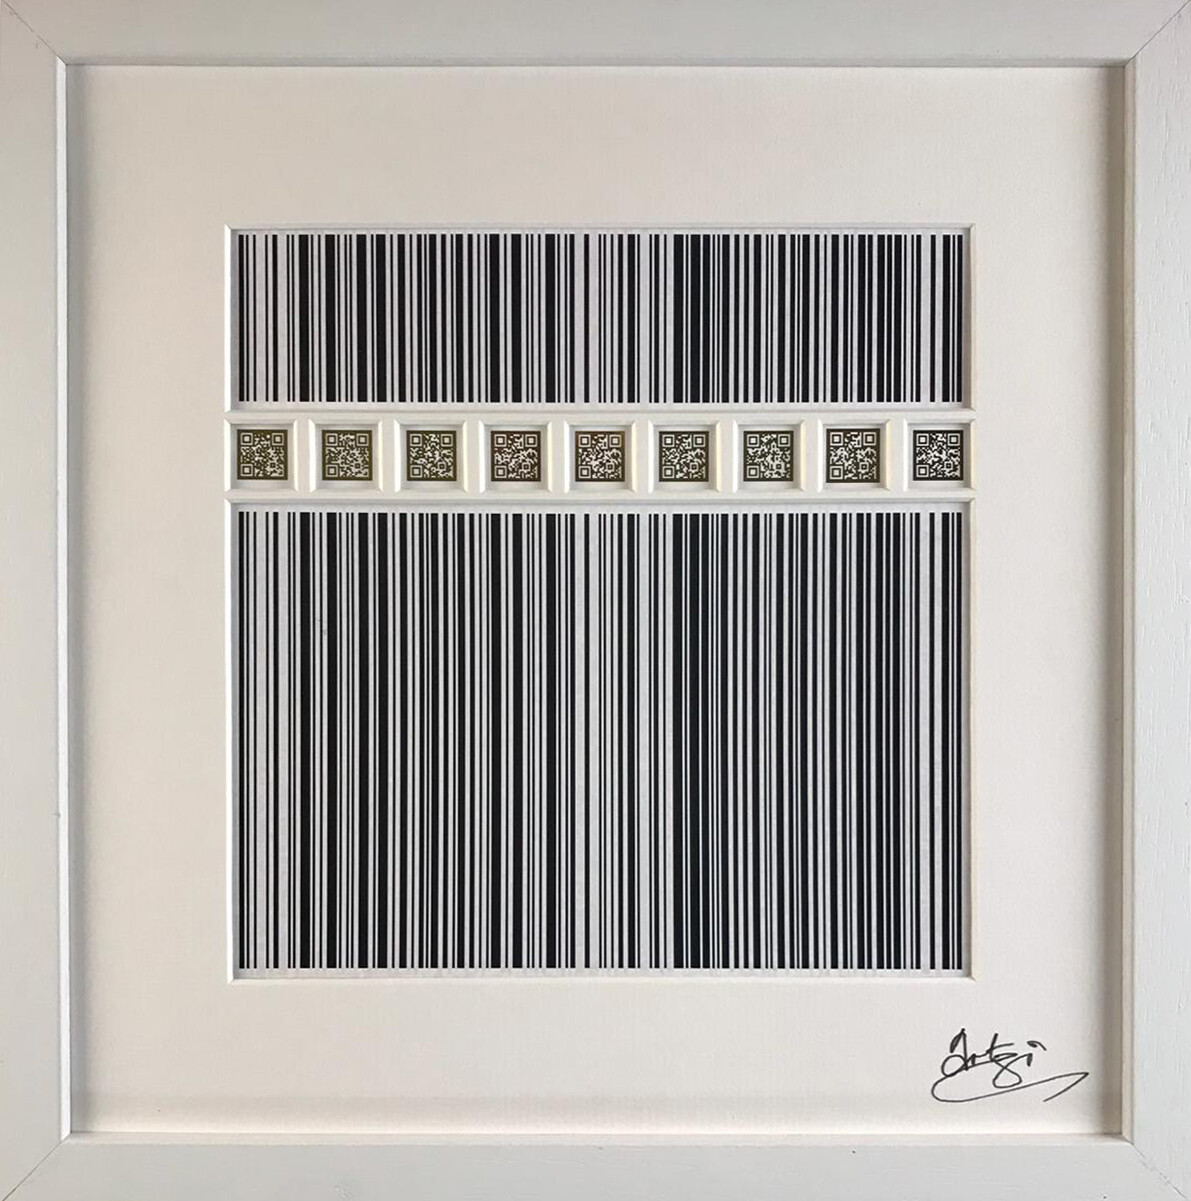 Kaaba - Code of Life in White Box Frame